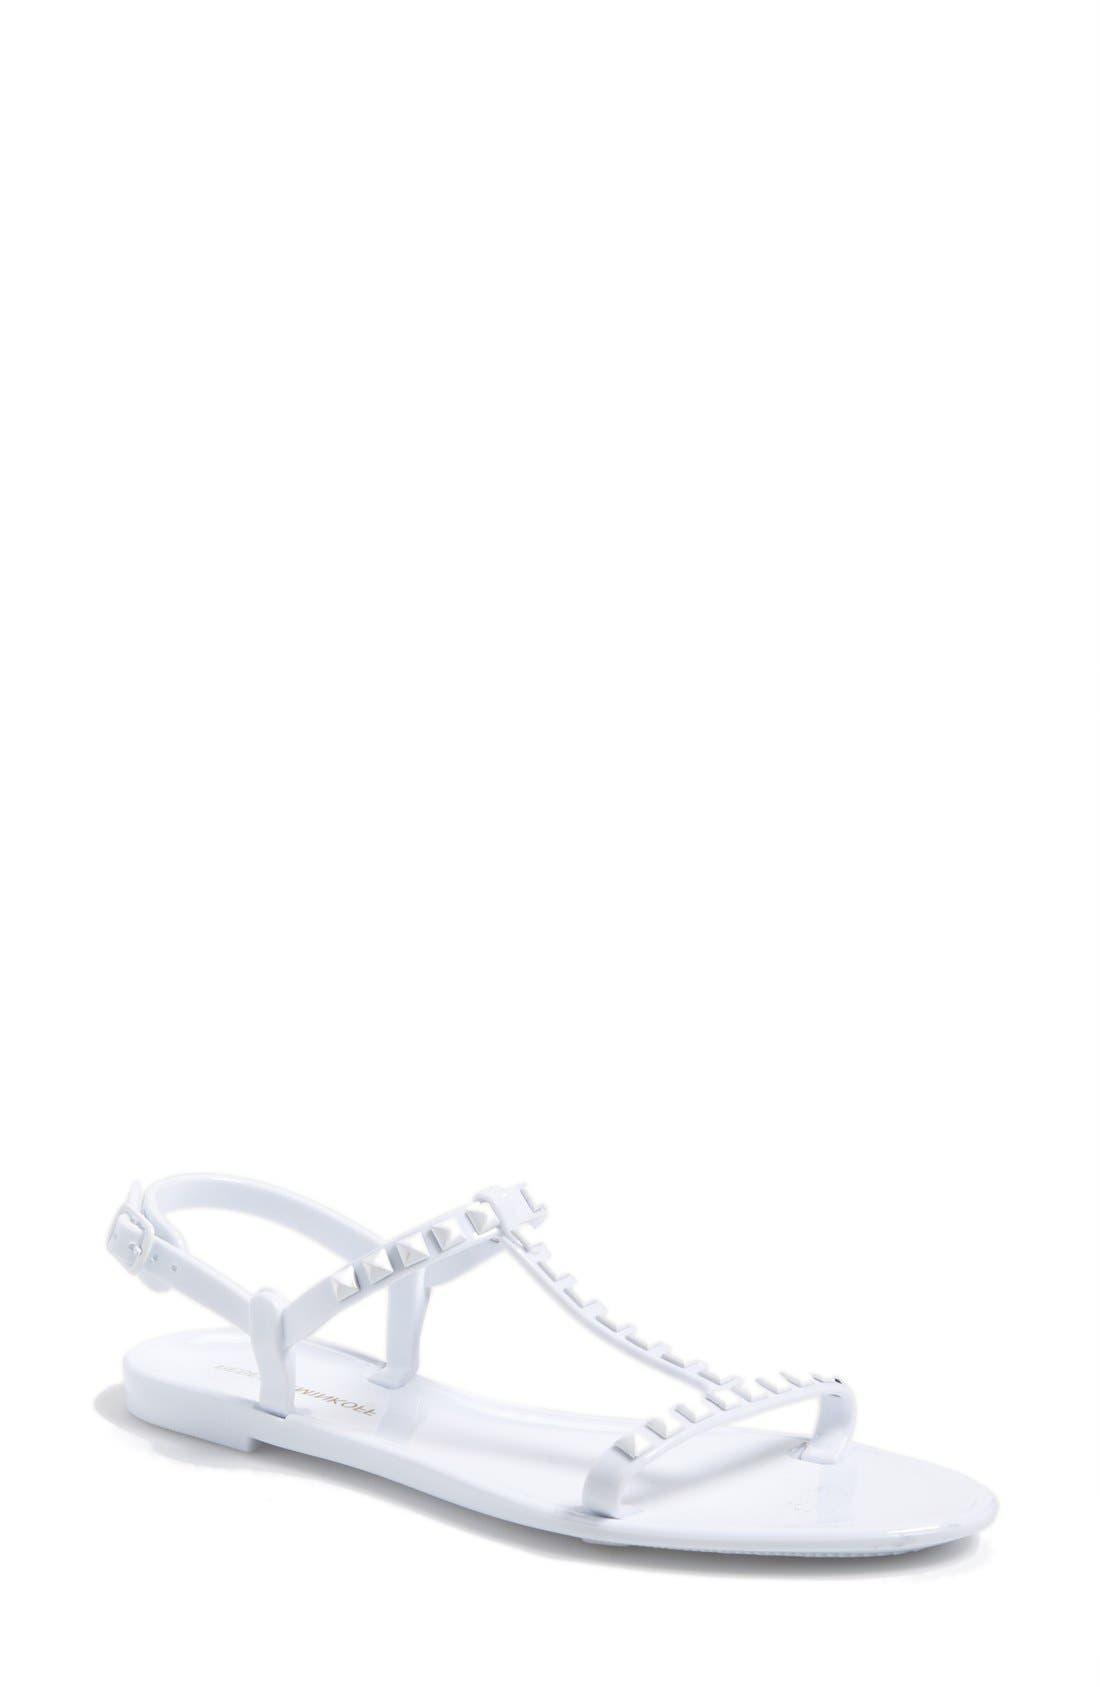 Alternate Image 1 Selected - Rebecca Minkoff 'Sava' Sandal